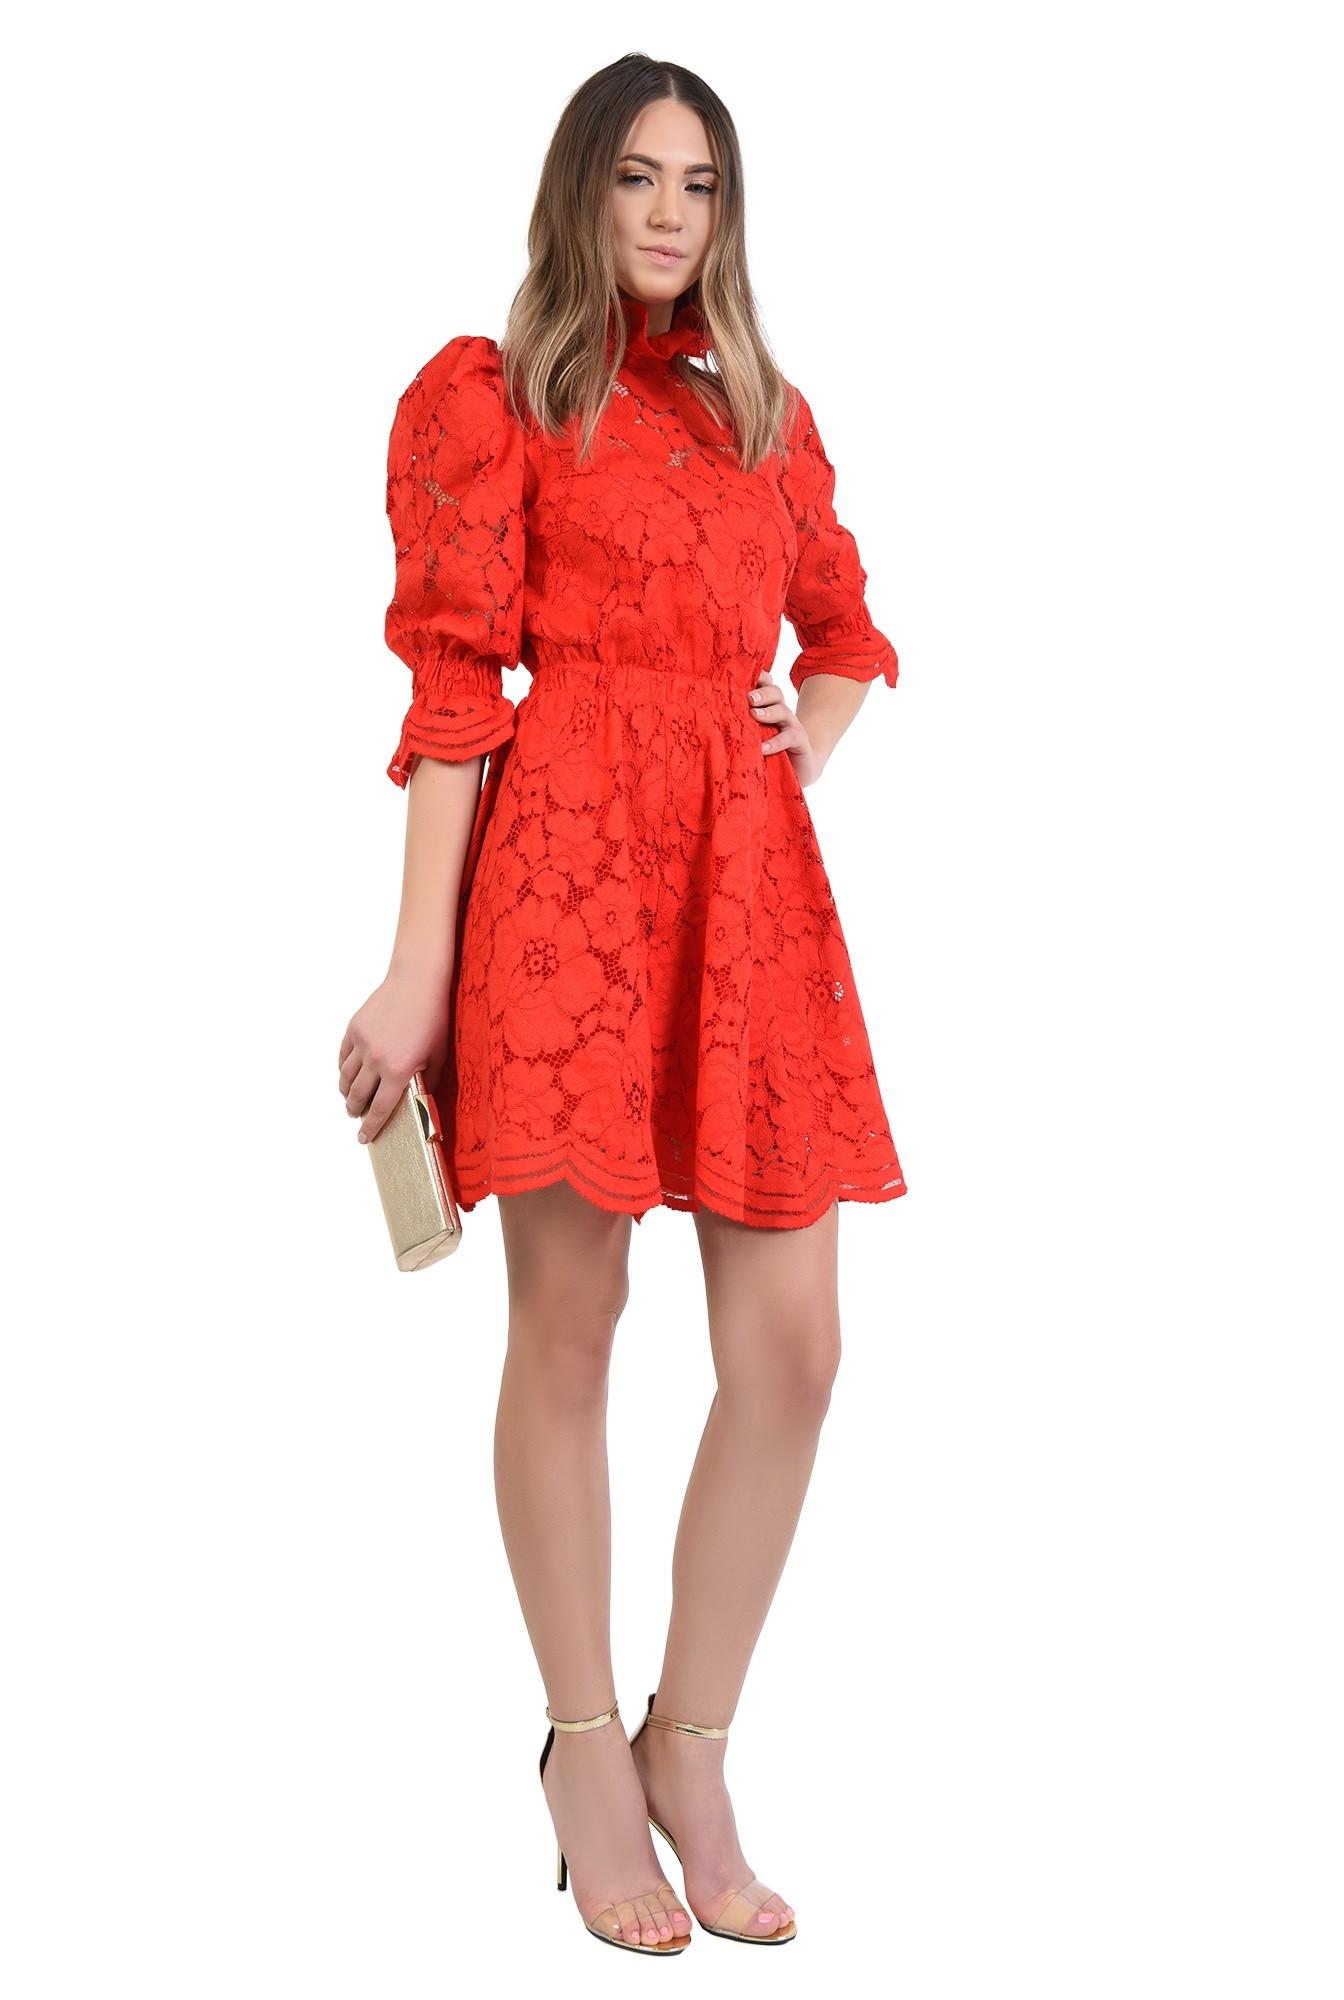 360 - rochie de ocazie, din dantela, rosie, clos, scurta